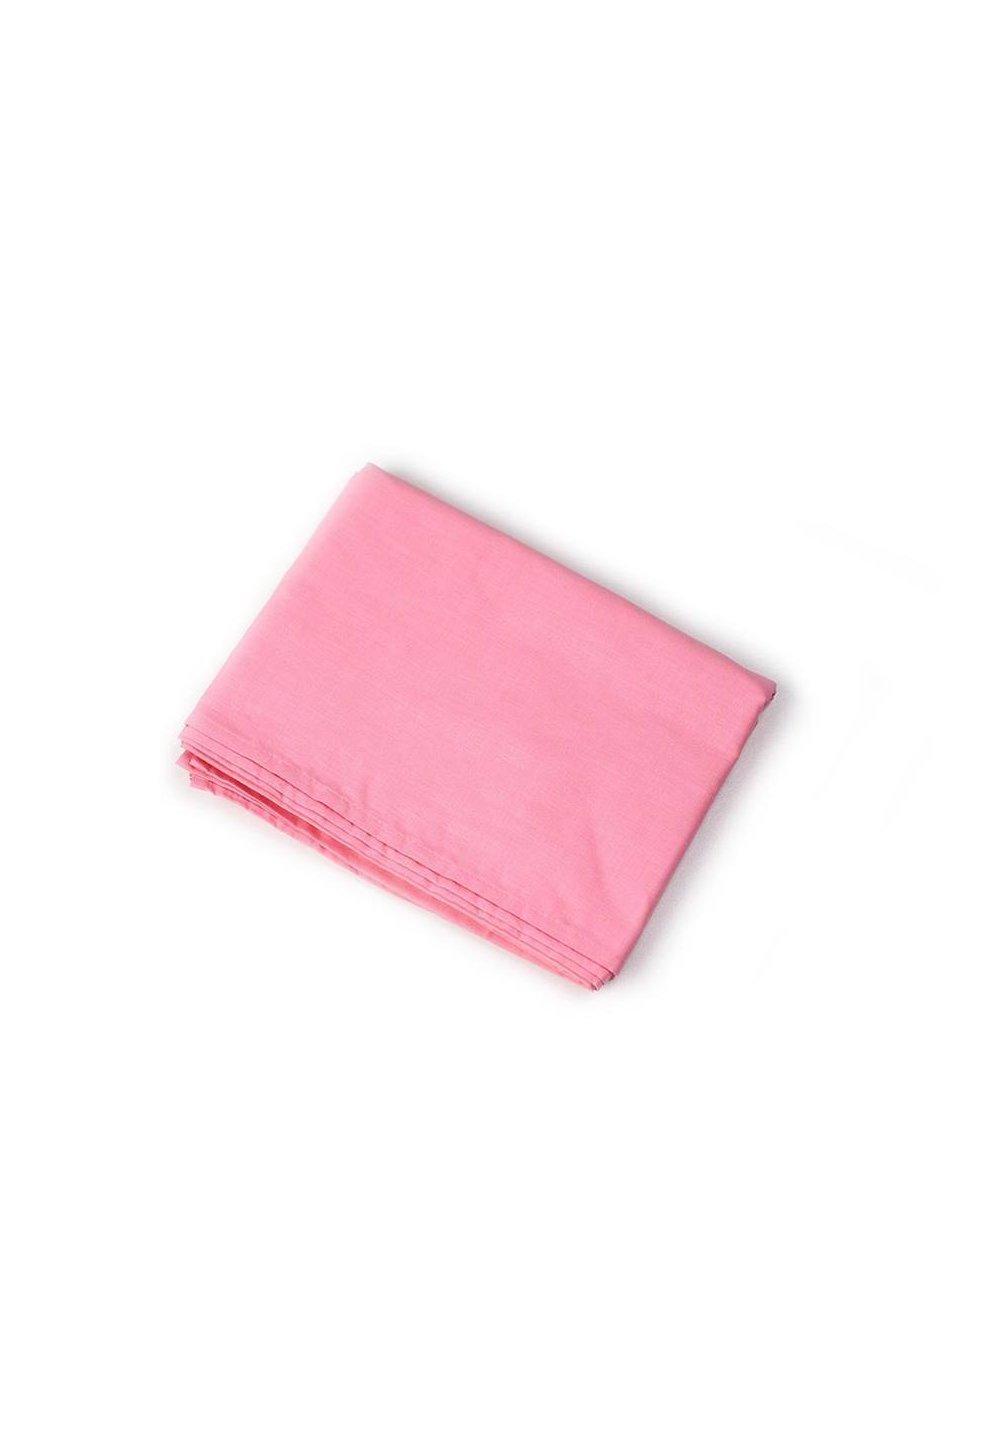 Cearceaf bumbac, roz, 160 x 210 cm imagine